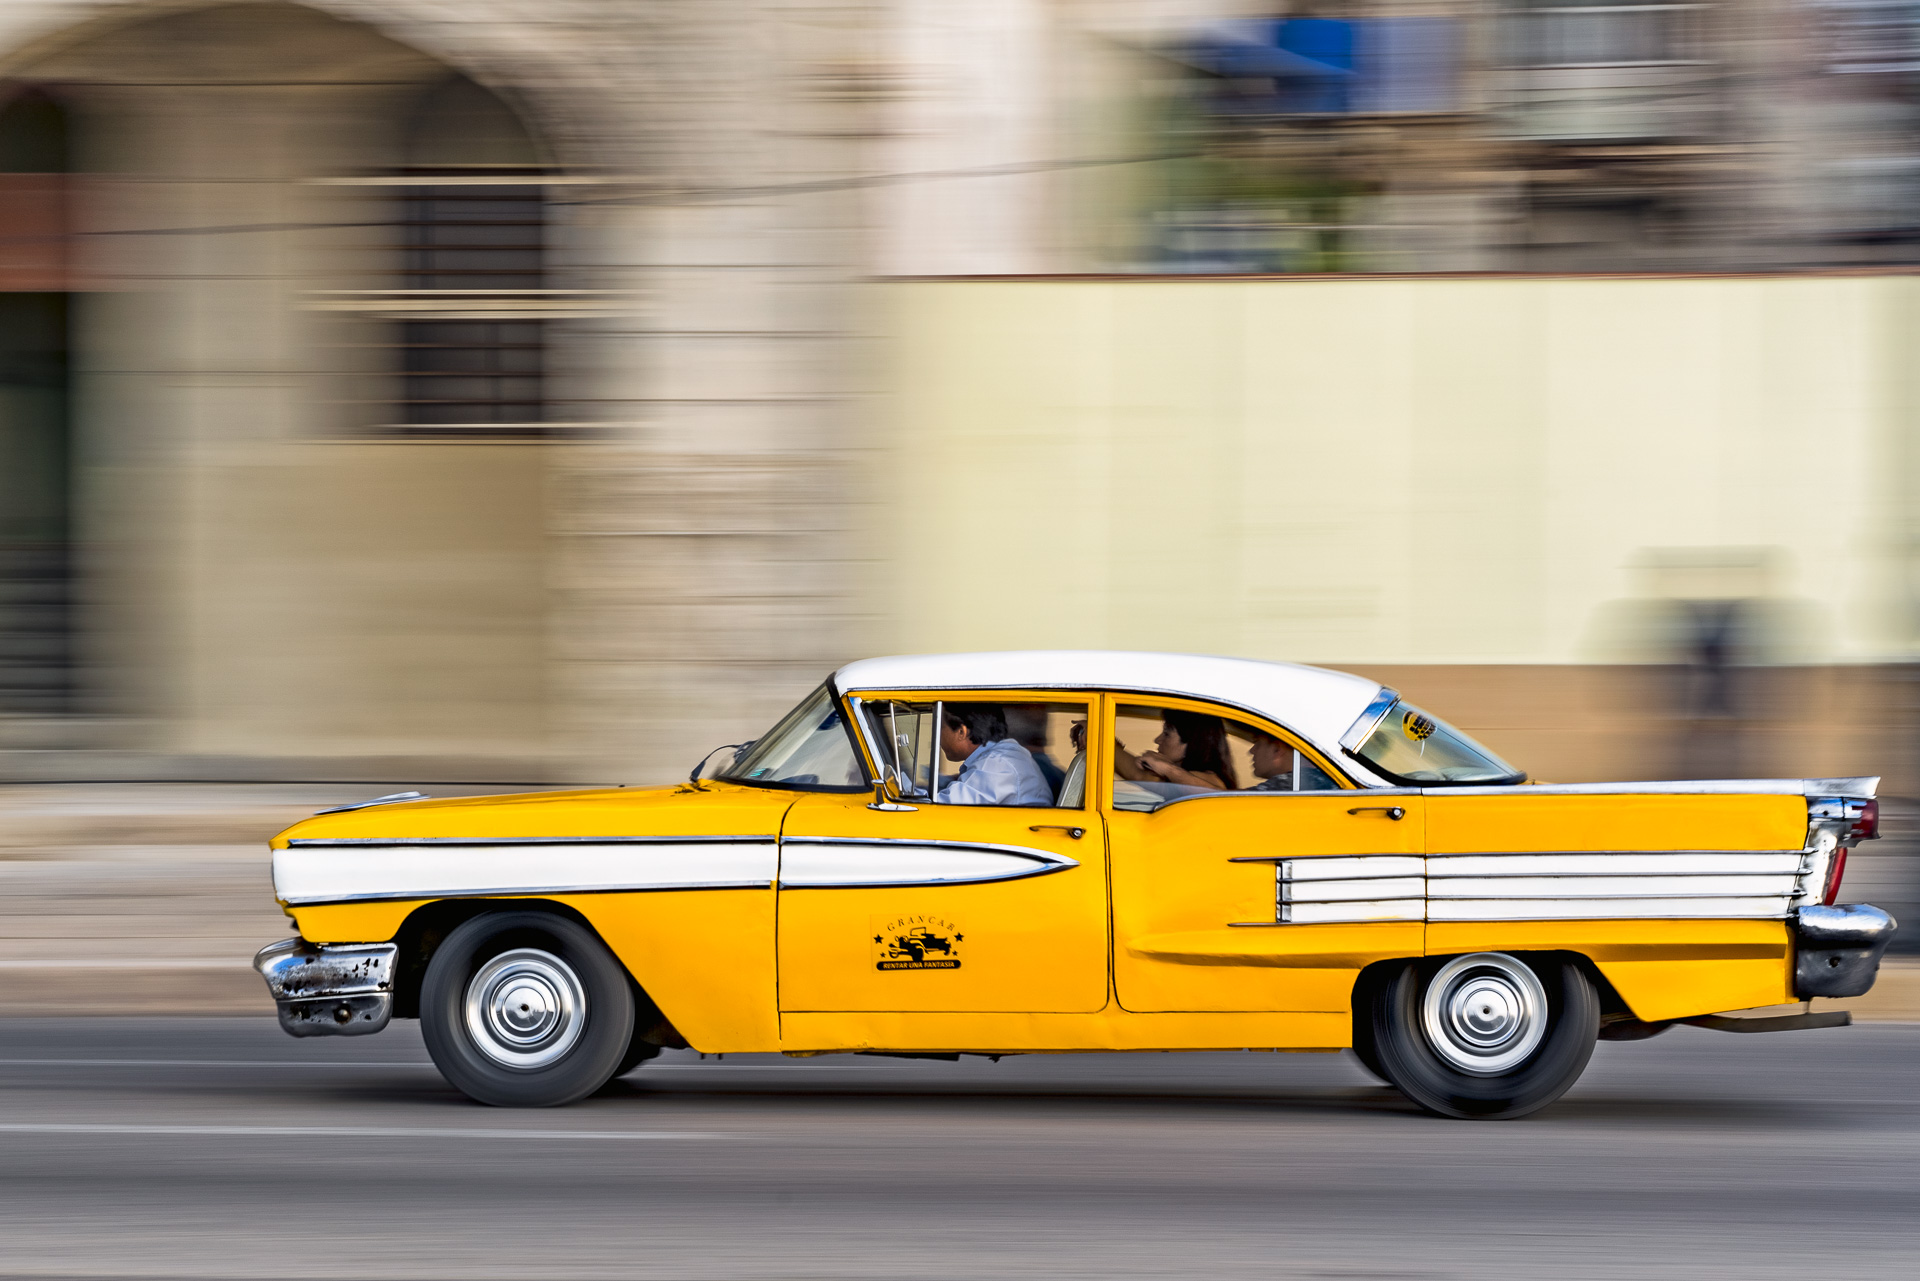 fotoreise-fotosafari-hd-2021-059-Kuba